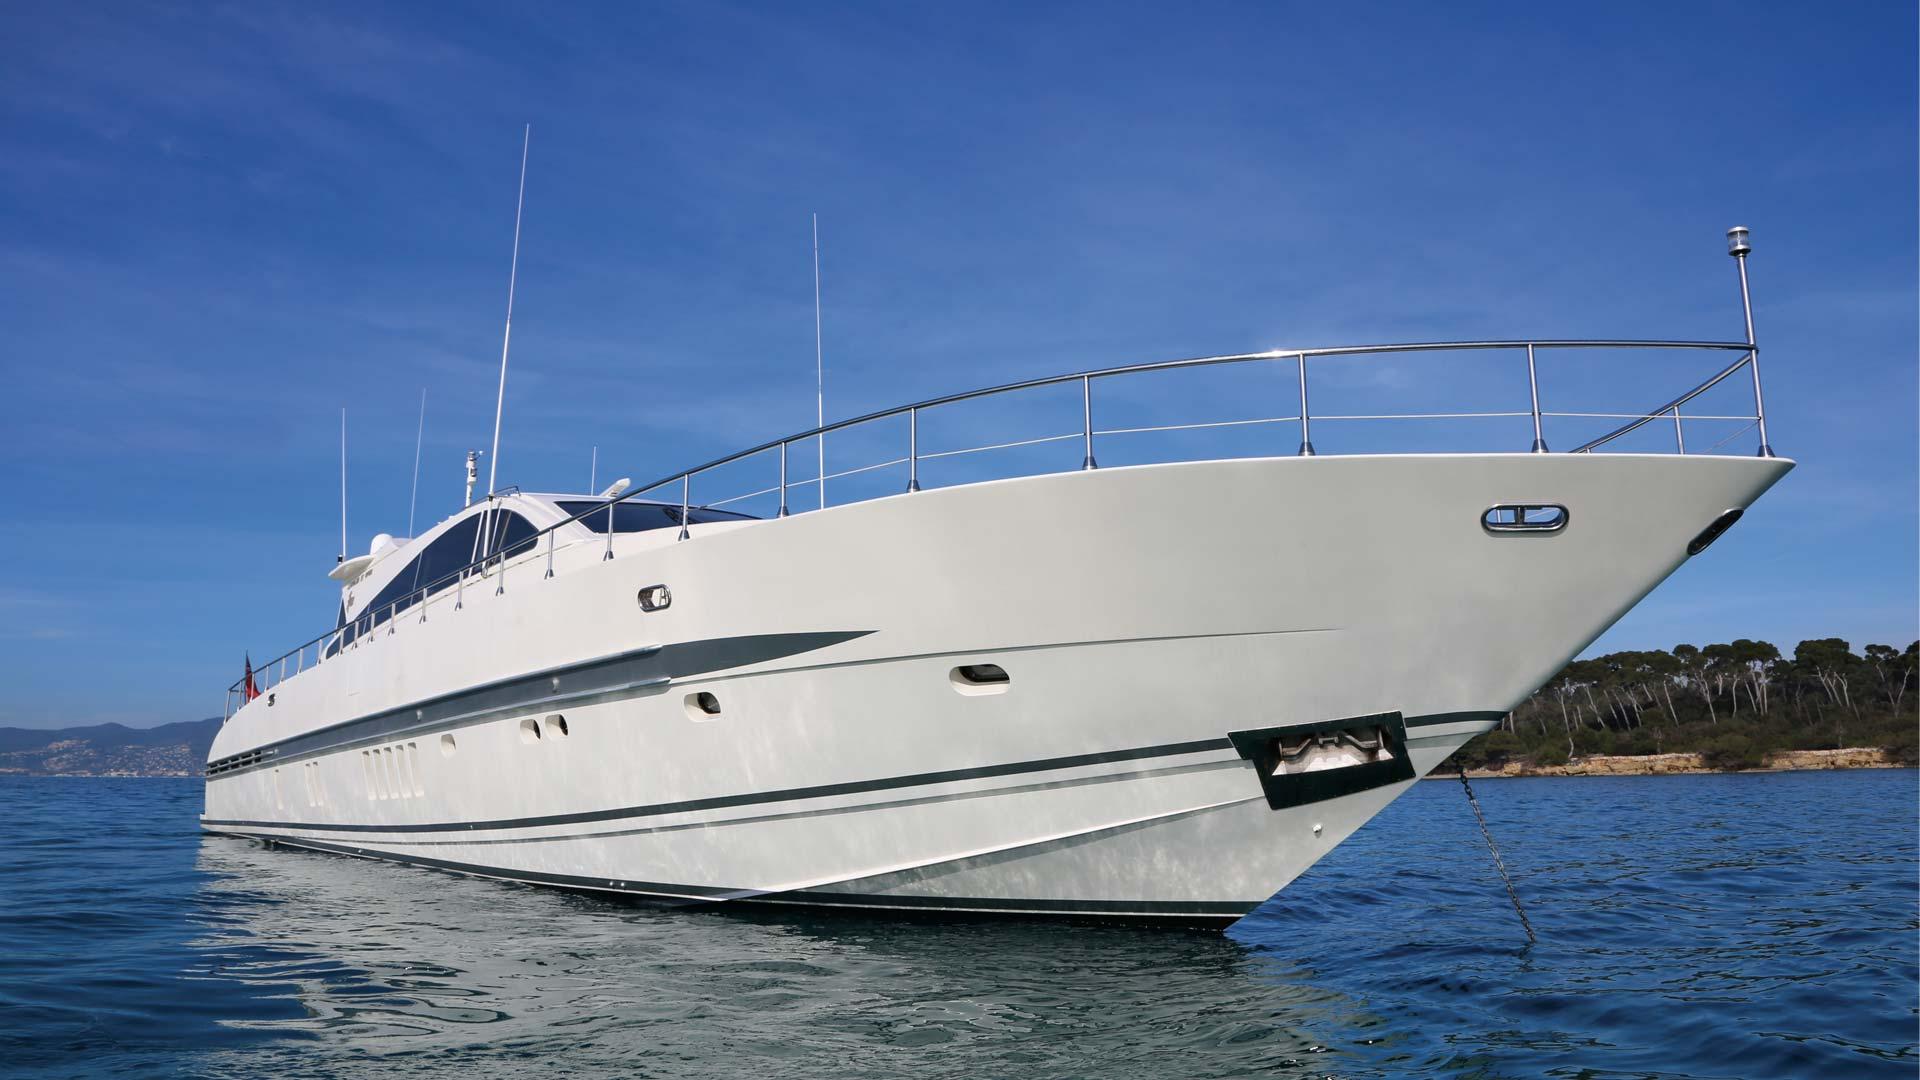 online yacht booking serenity atlantic leopard arno. Black Bedroom Furniture Sets. Home Design Ideas